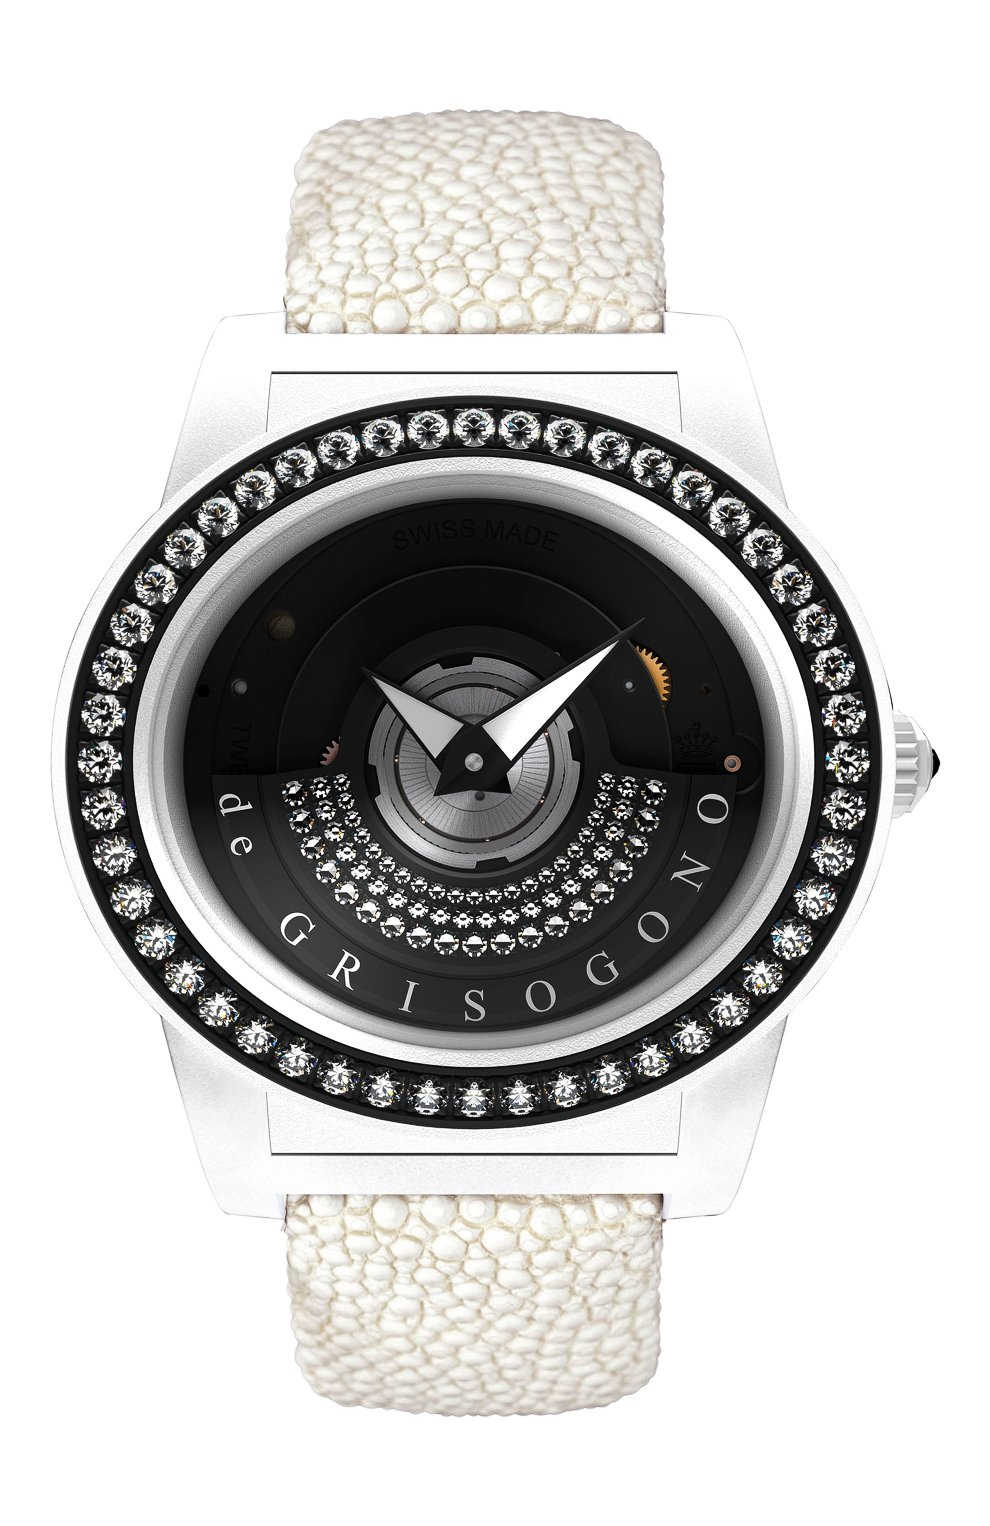 Женские часы white DE GRISOGONO черного цвета, арт. TONDO BY NIGHT S01 | Фото 1